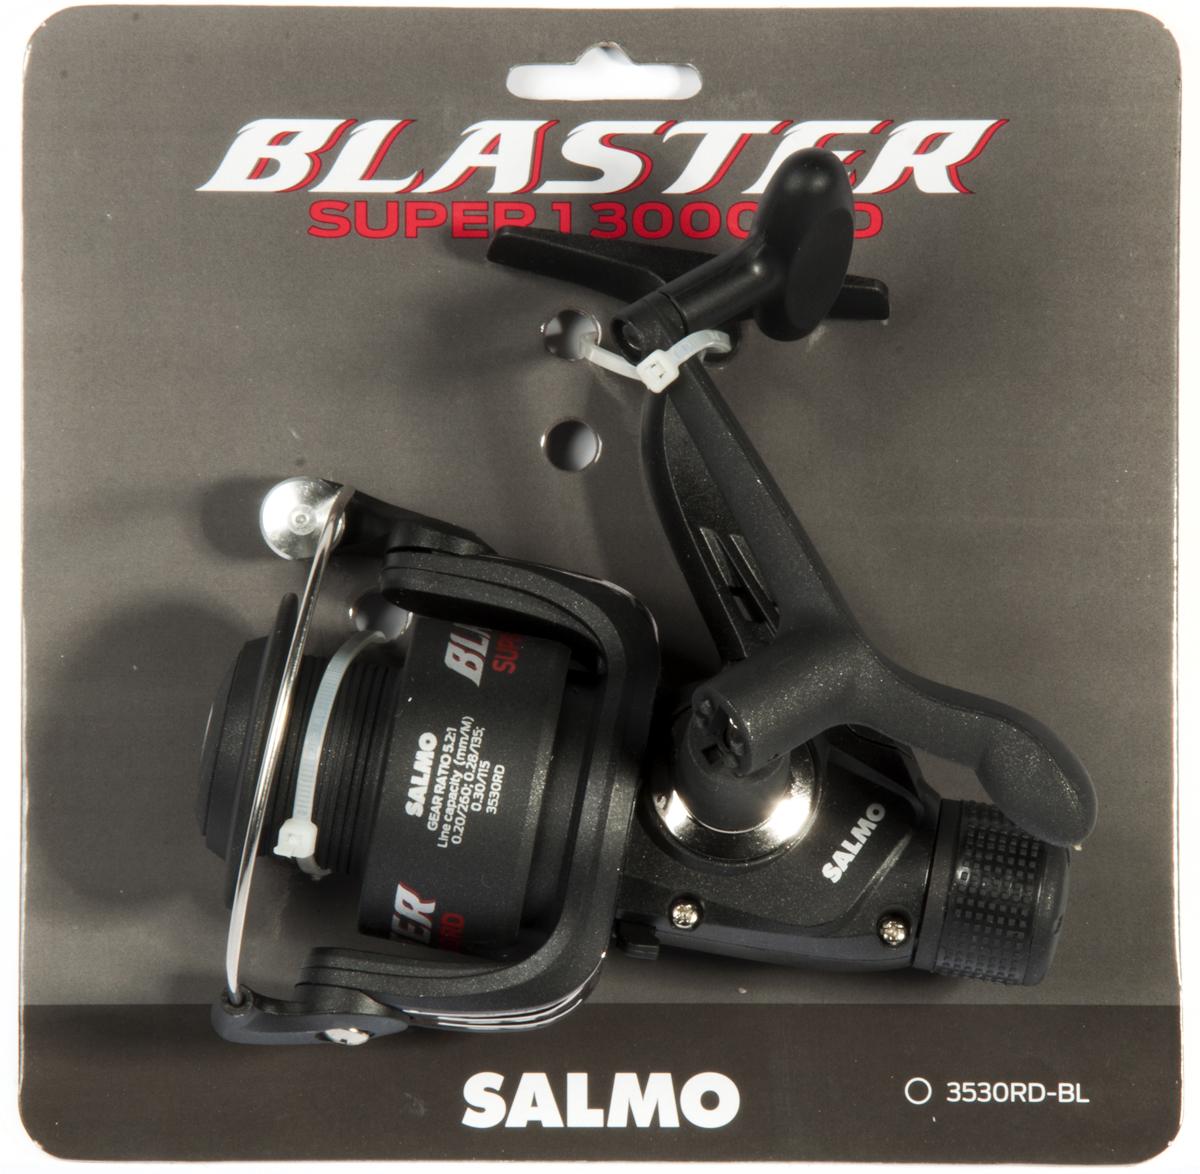 катушка salmo blaster spin 1 20rd 1920rd Катушка безынерционная Salmo Blaster SUPER 1 30RD